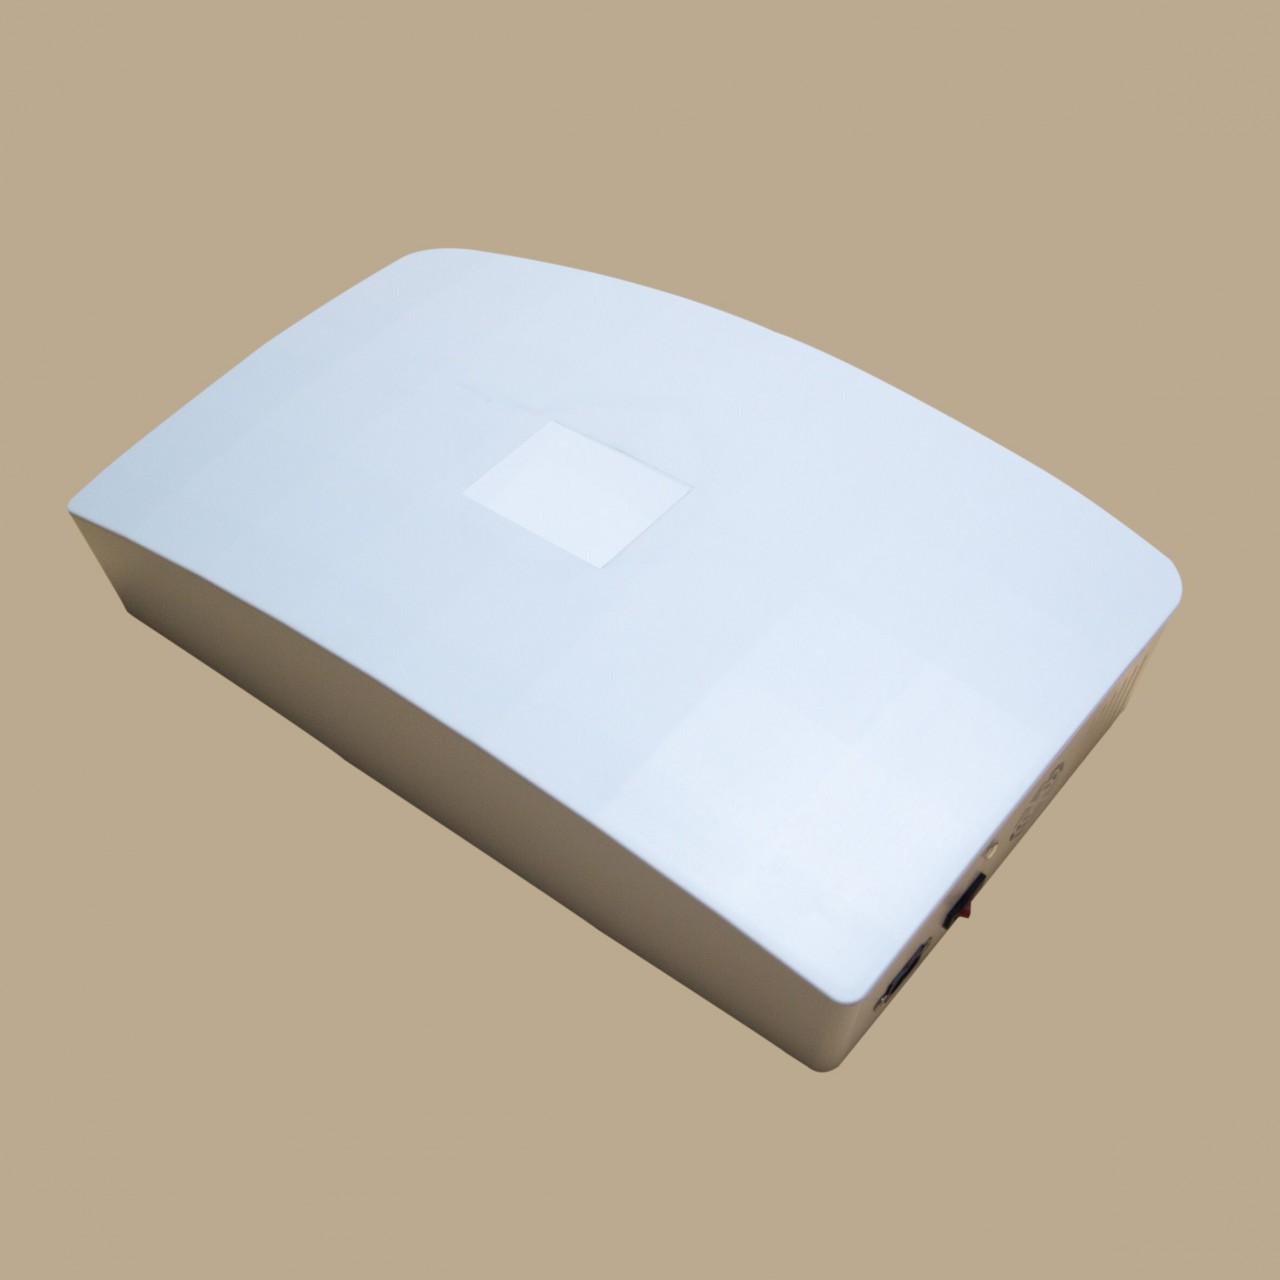 Built-in Antenna Jammer WiFi/Bluetooth + UHF + VHF + 2G/3G/4G Mobile Phone signal Blocker